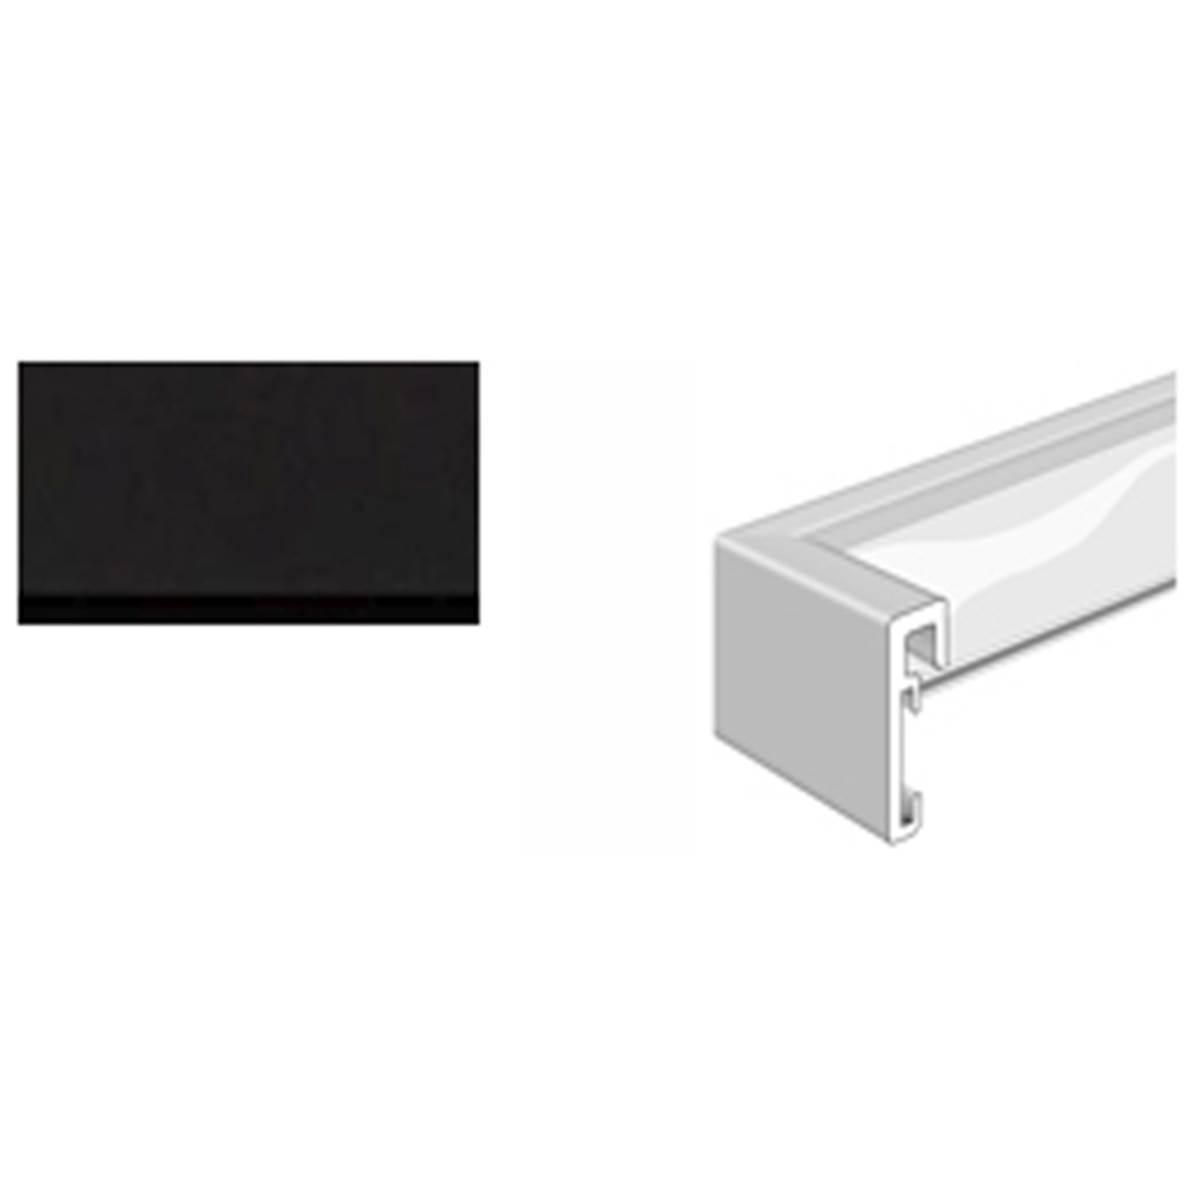 nielsen cadre alpha noir anodis mat 50x70 prophot. Black Bedroom Furniture Sets. Home Design Ideas